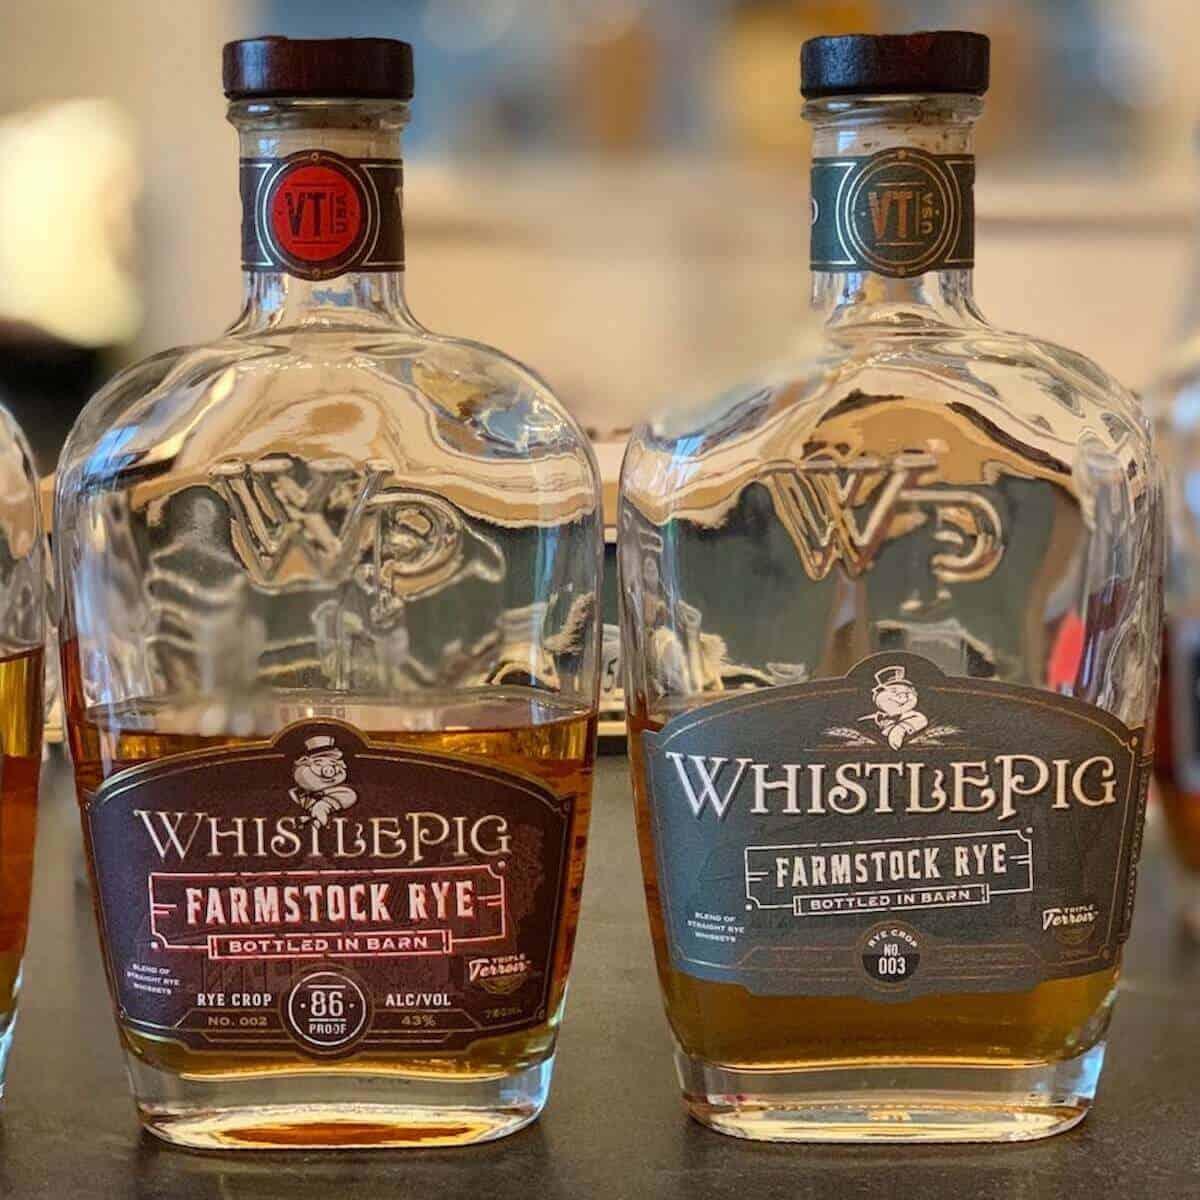 WhistlePig Rye Farmstock Crop Whiskeys